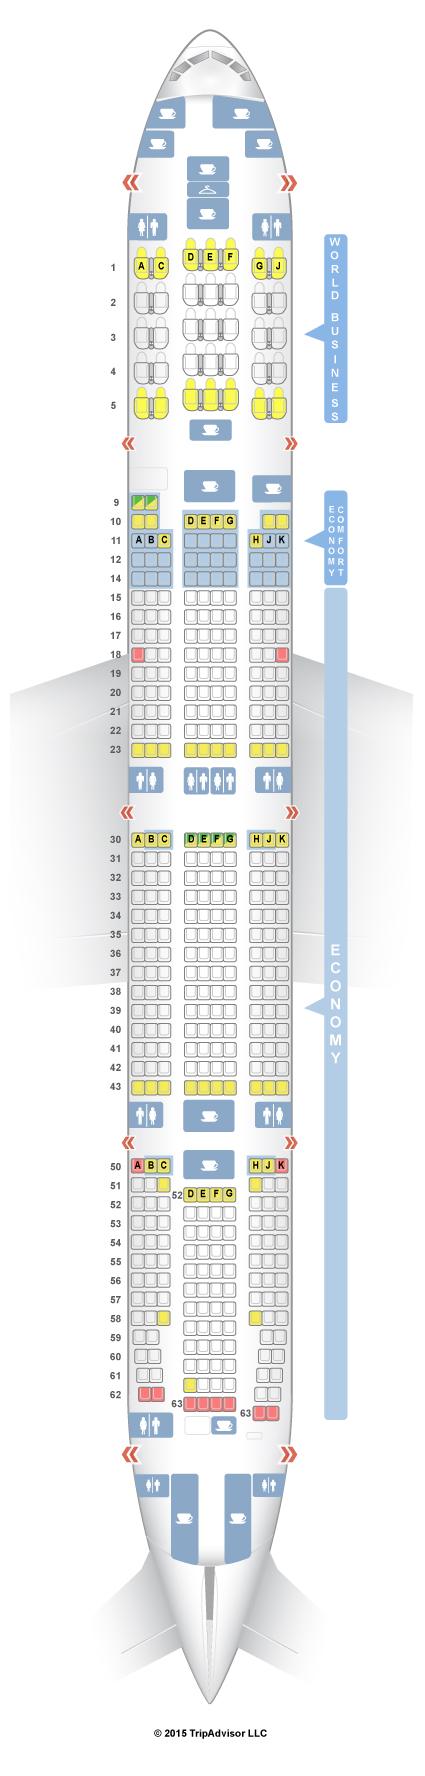 Seatguru aa 777- 772 seating